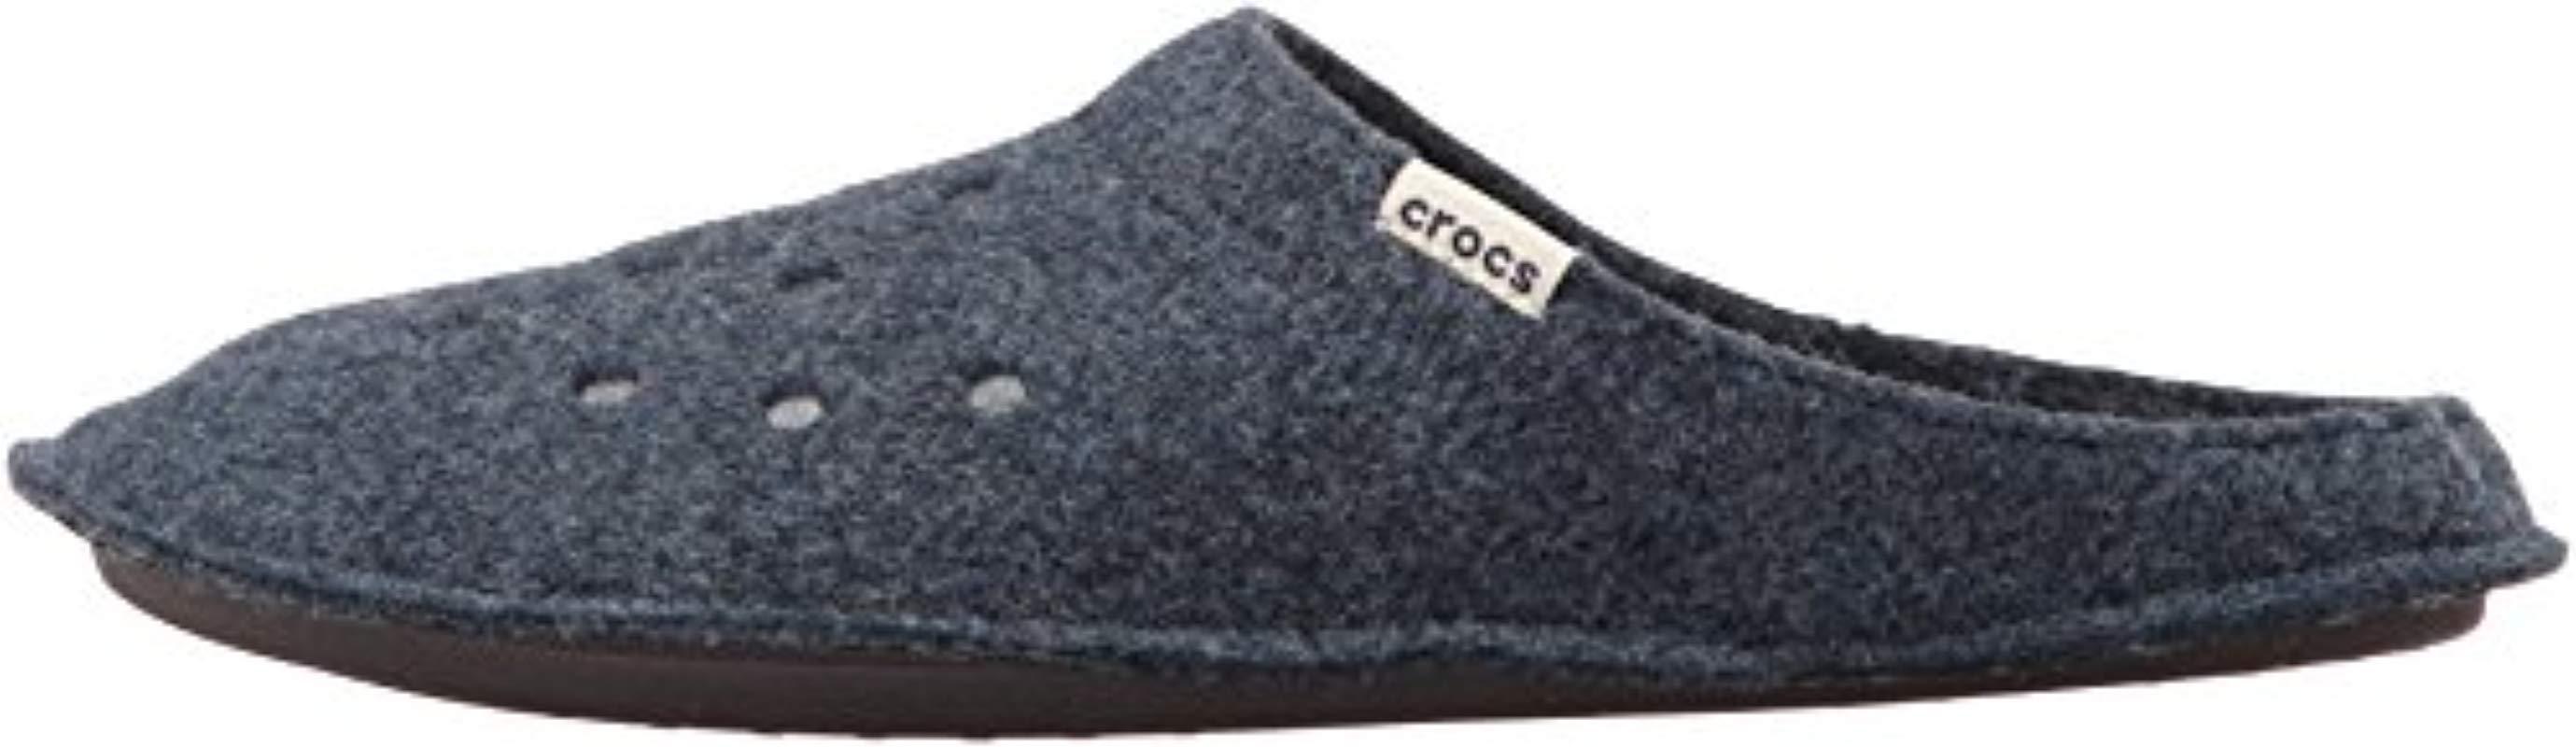 52a30d0776 Lyst - Crocs™ Unisex Adults  Classic Slipper U in Blue for Men - Save 17%